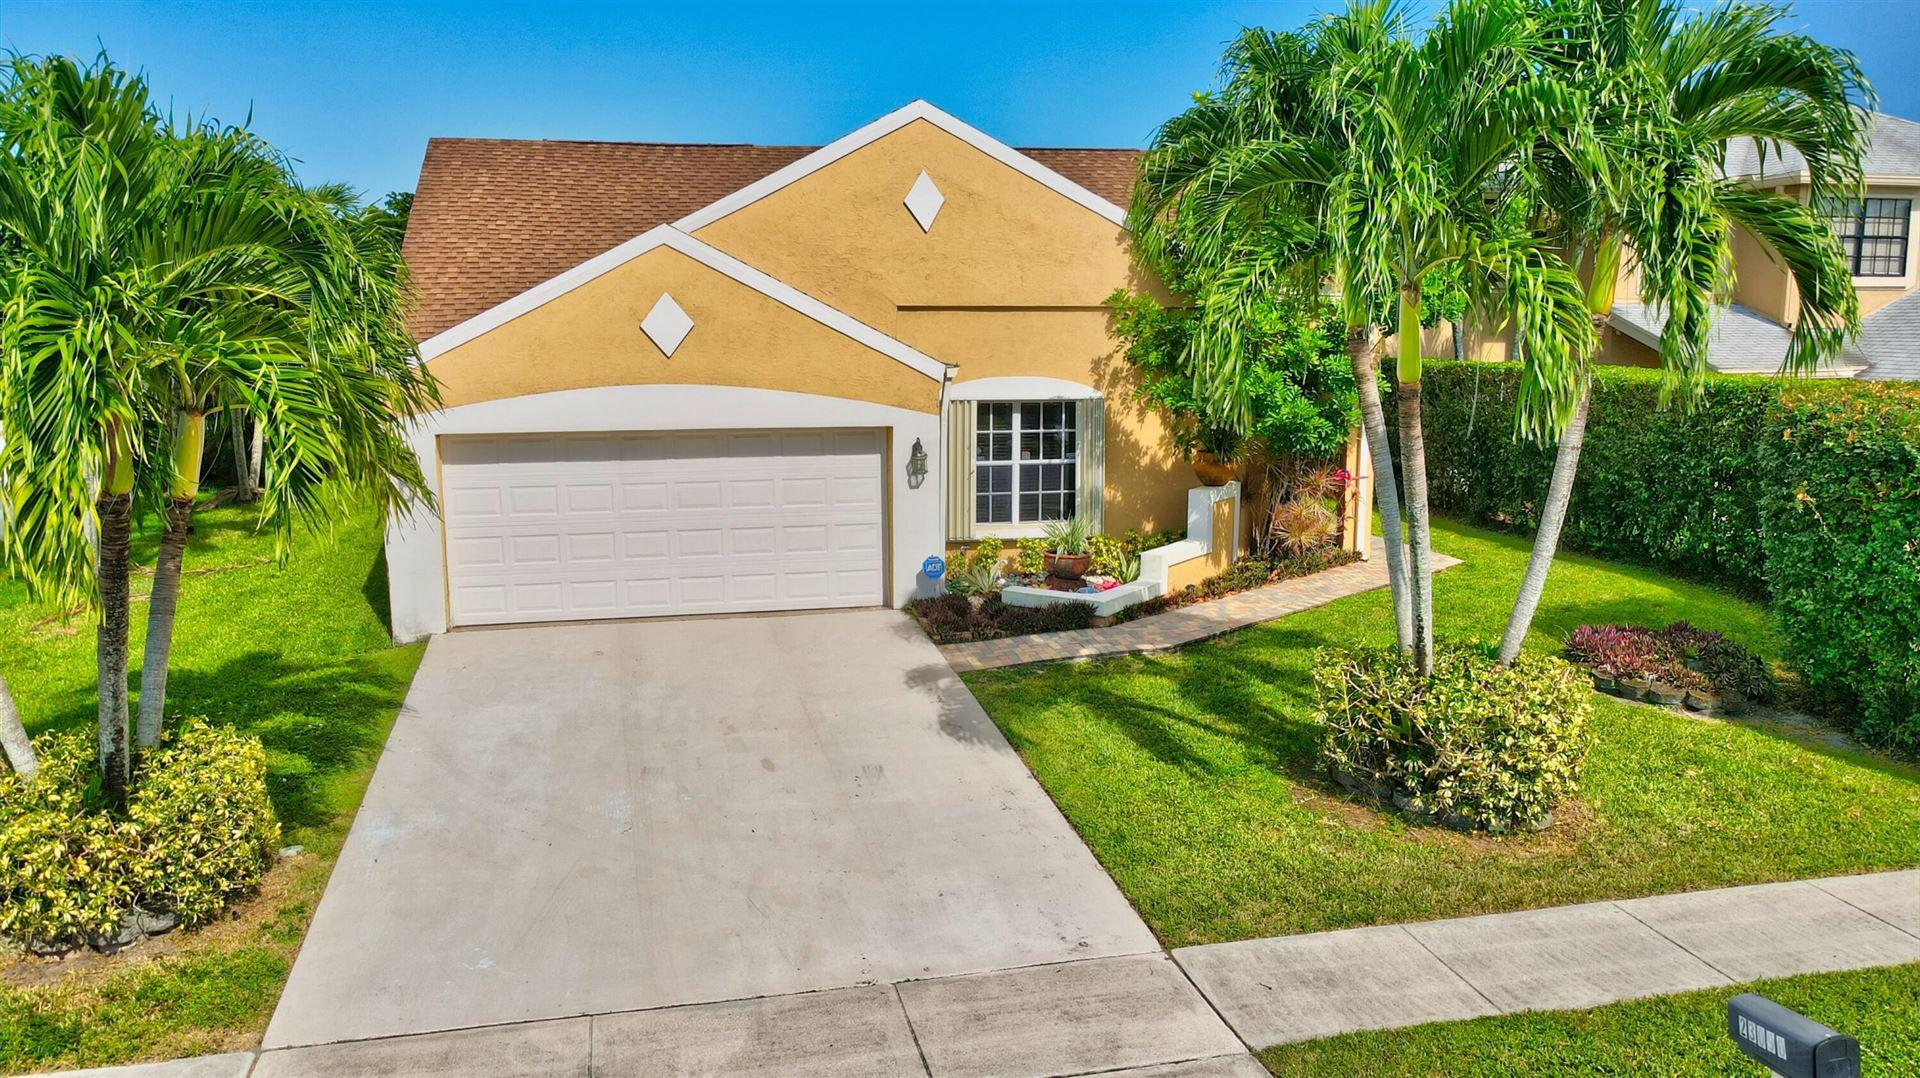 23090 Floralwood Lane, Boca Raton, FL 33433 - MLS#: RX-10743673